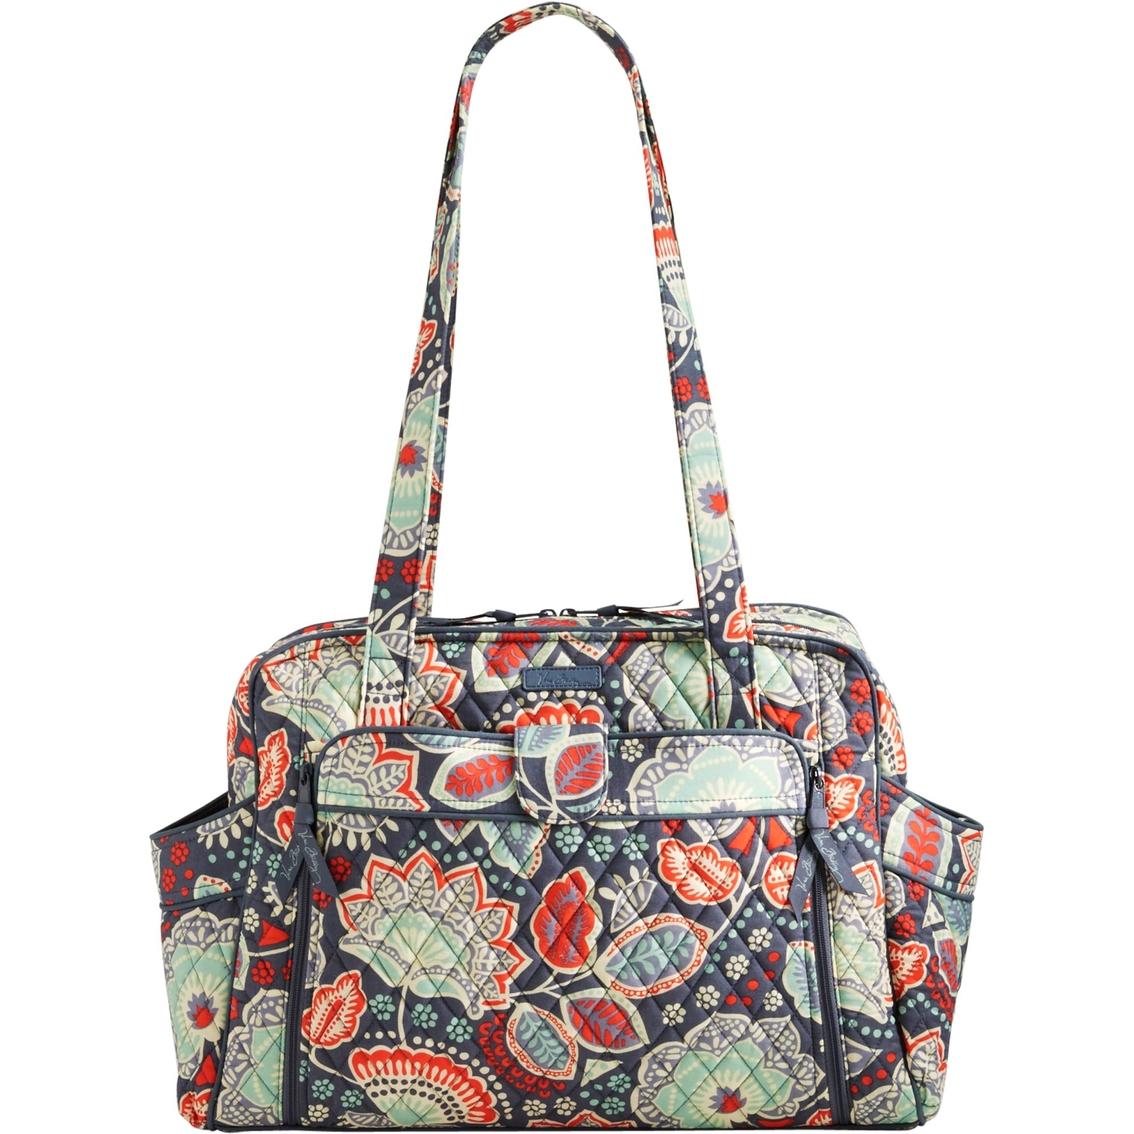 Vera Bradley Stroll Around Baby Bag, Nomadic Floral